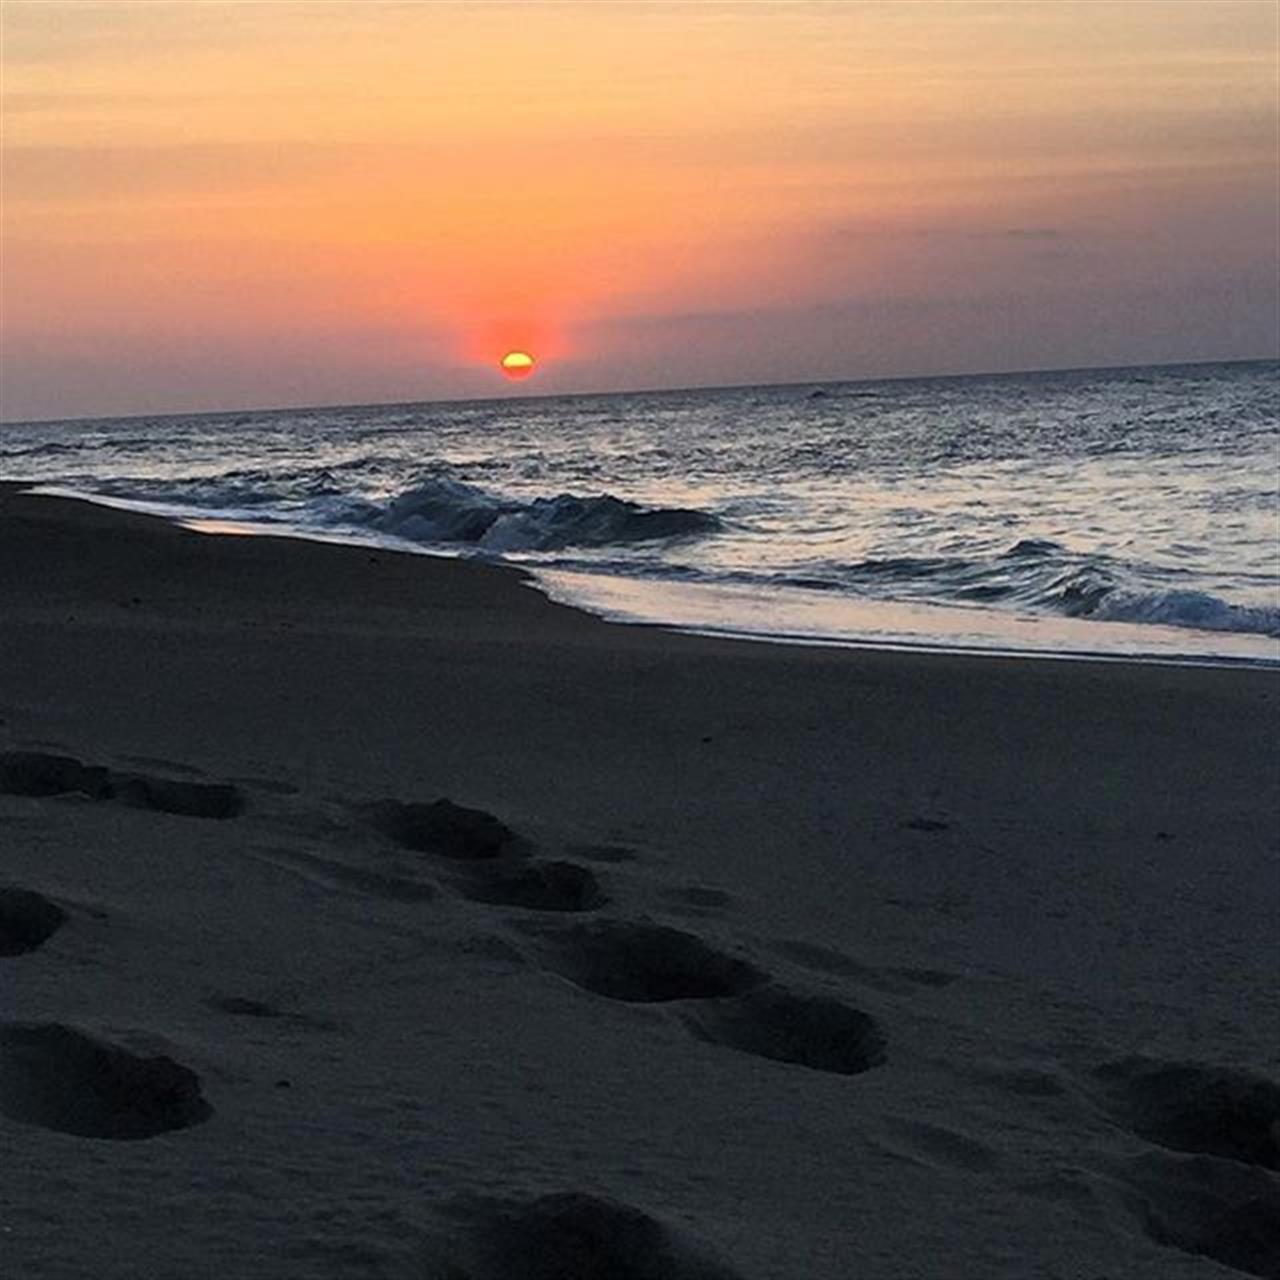 Beautiful sunset #dominicanrepublic #leadingrelocal